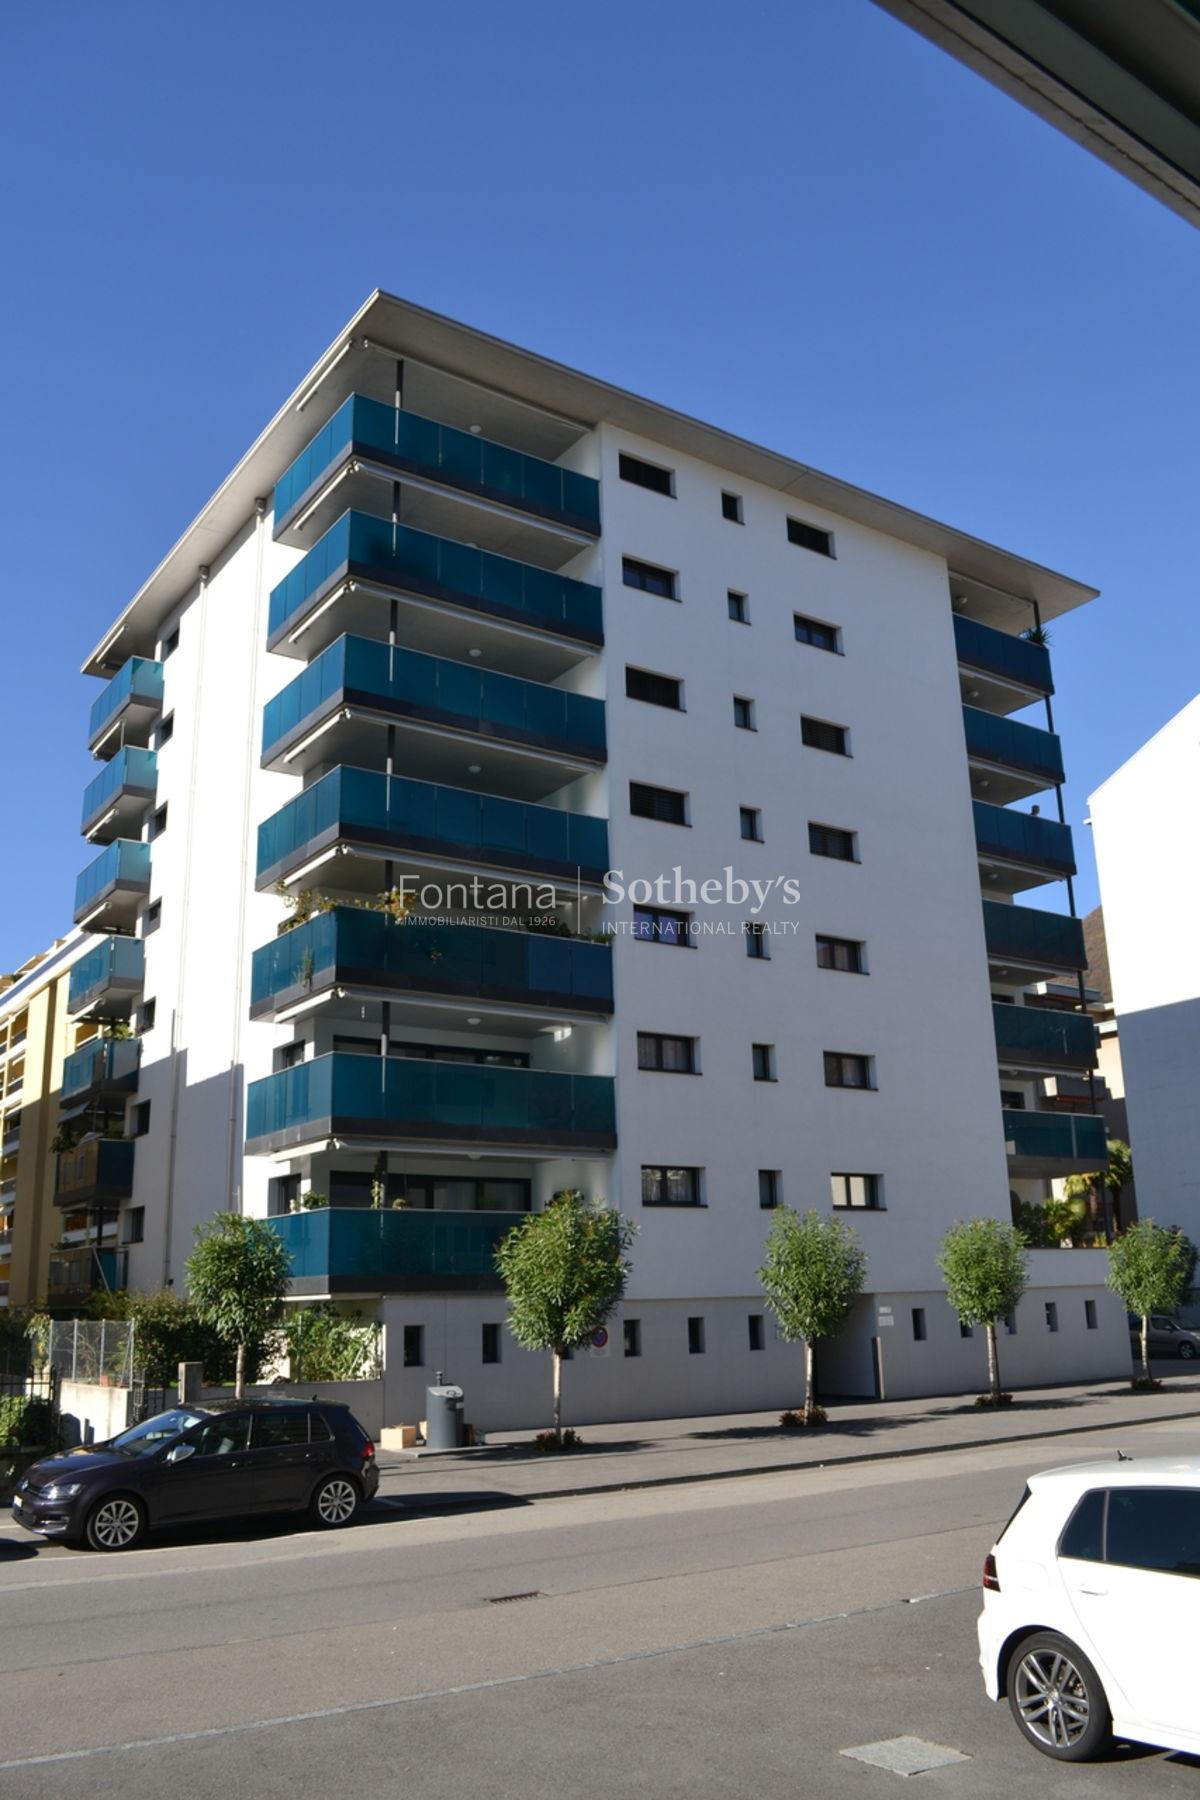 Apartment for Sale at Beautiful 3.5 room apartment in the center of Locarno Locarno, Ticino 6600 Switzerland